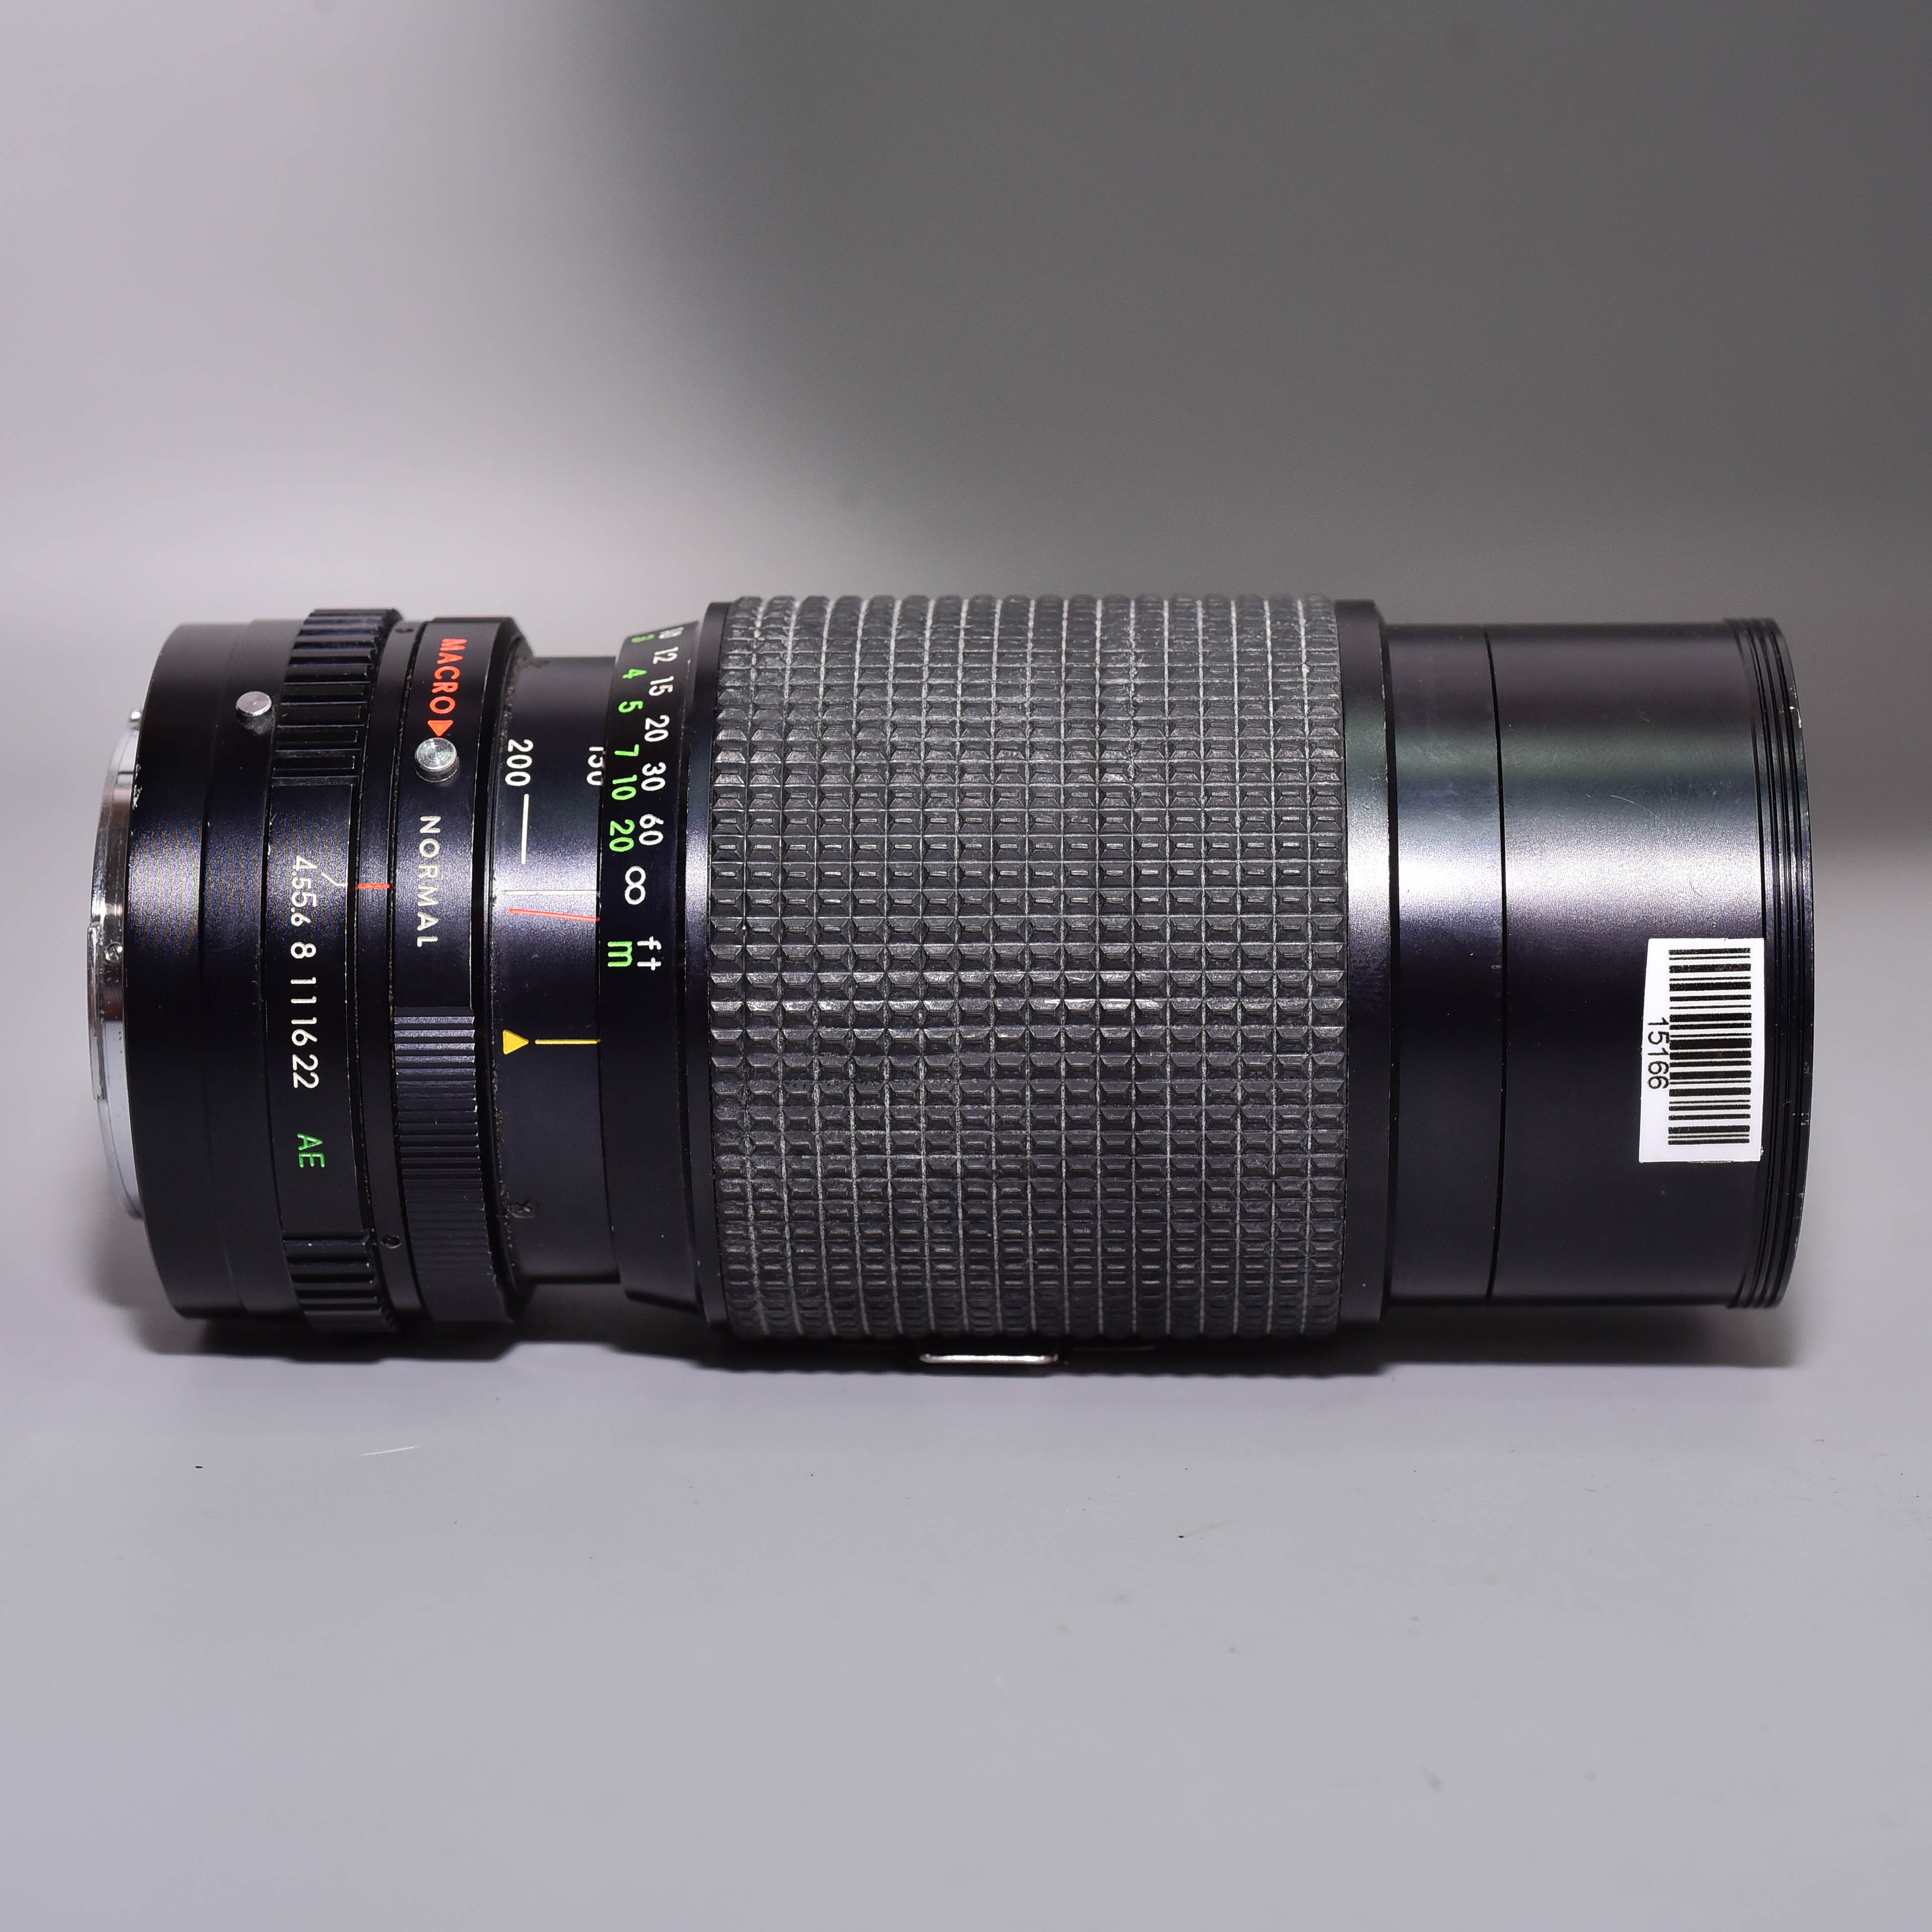 toyo-mc-auto-80-200mm-f4-5-macro-mf-konica-ar-toyo-80-200-4-5-15166